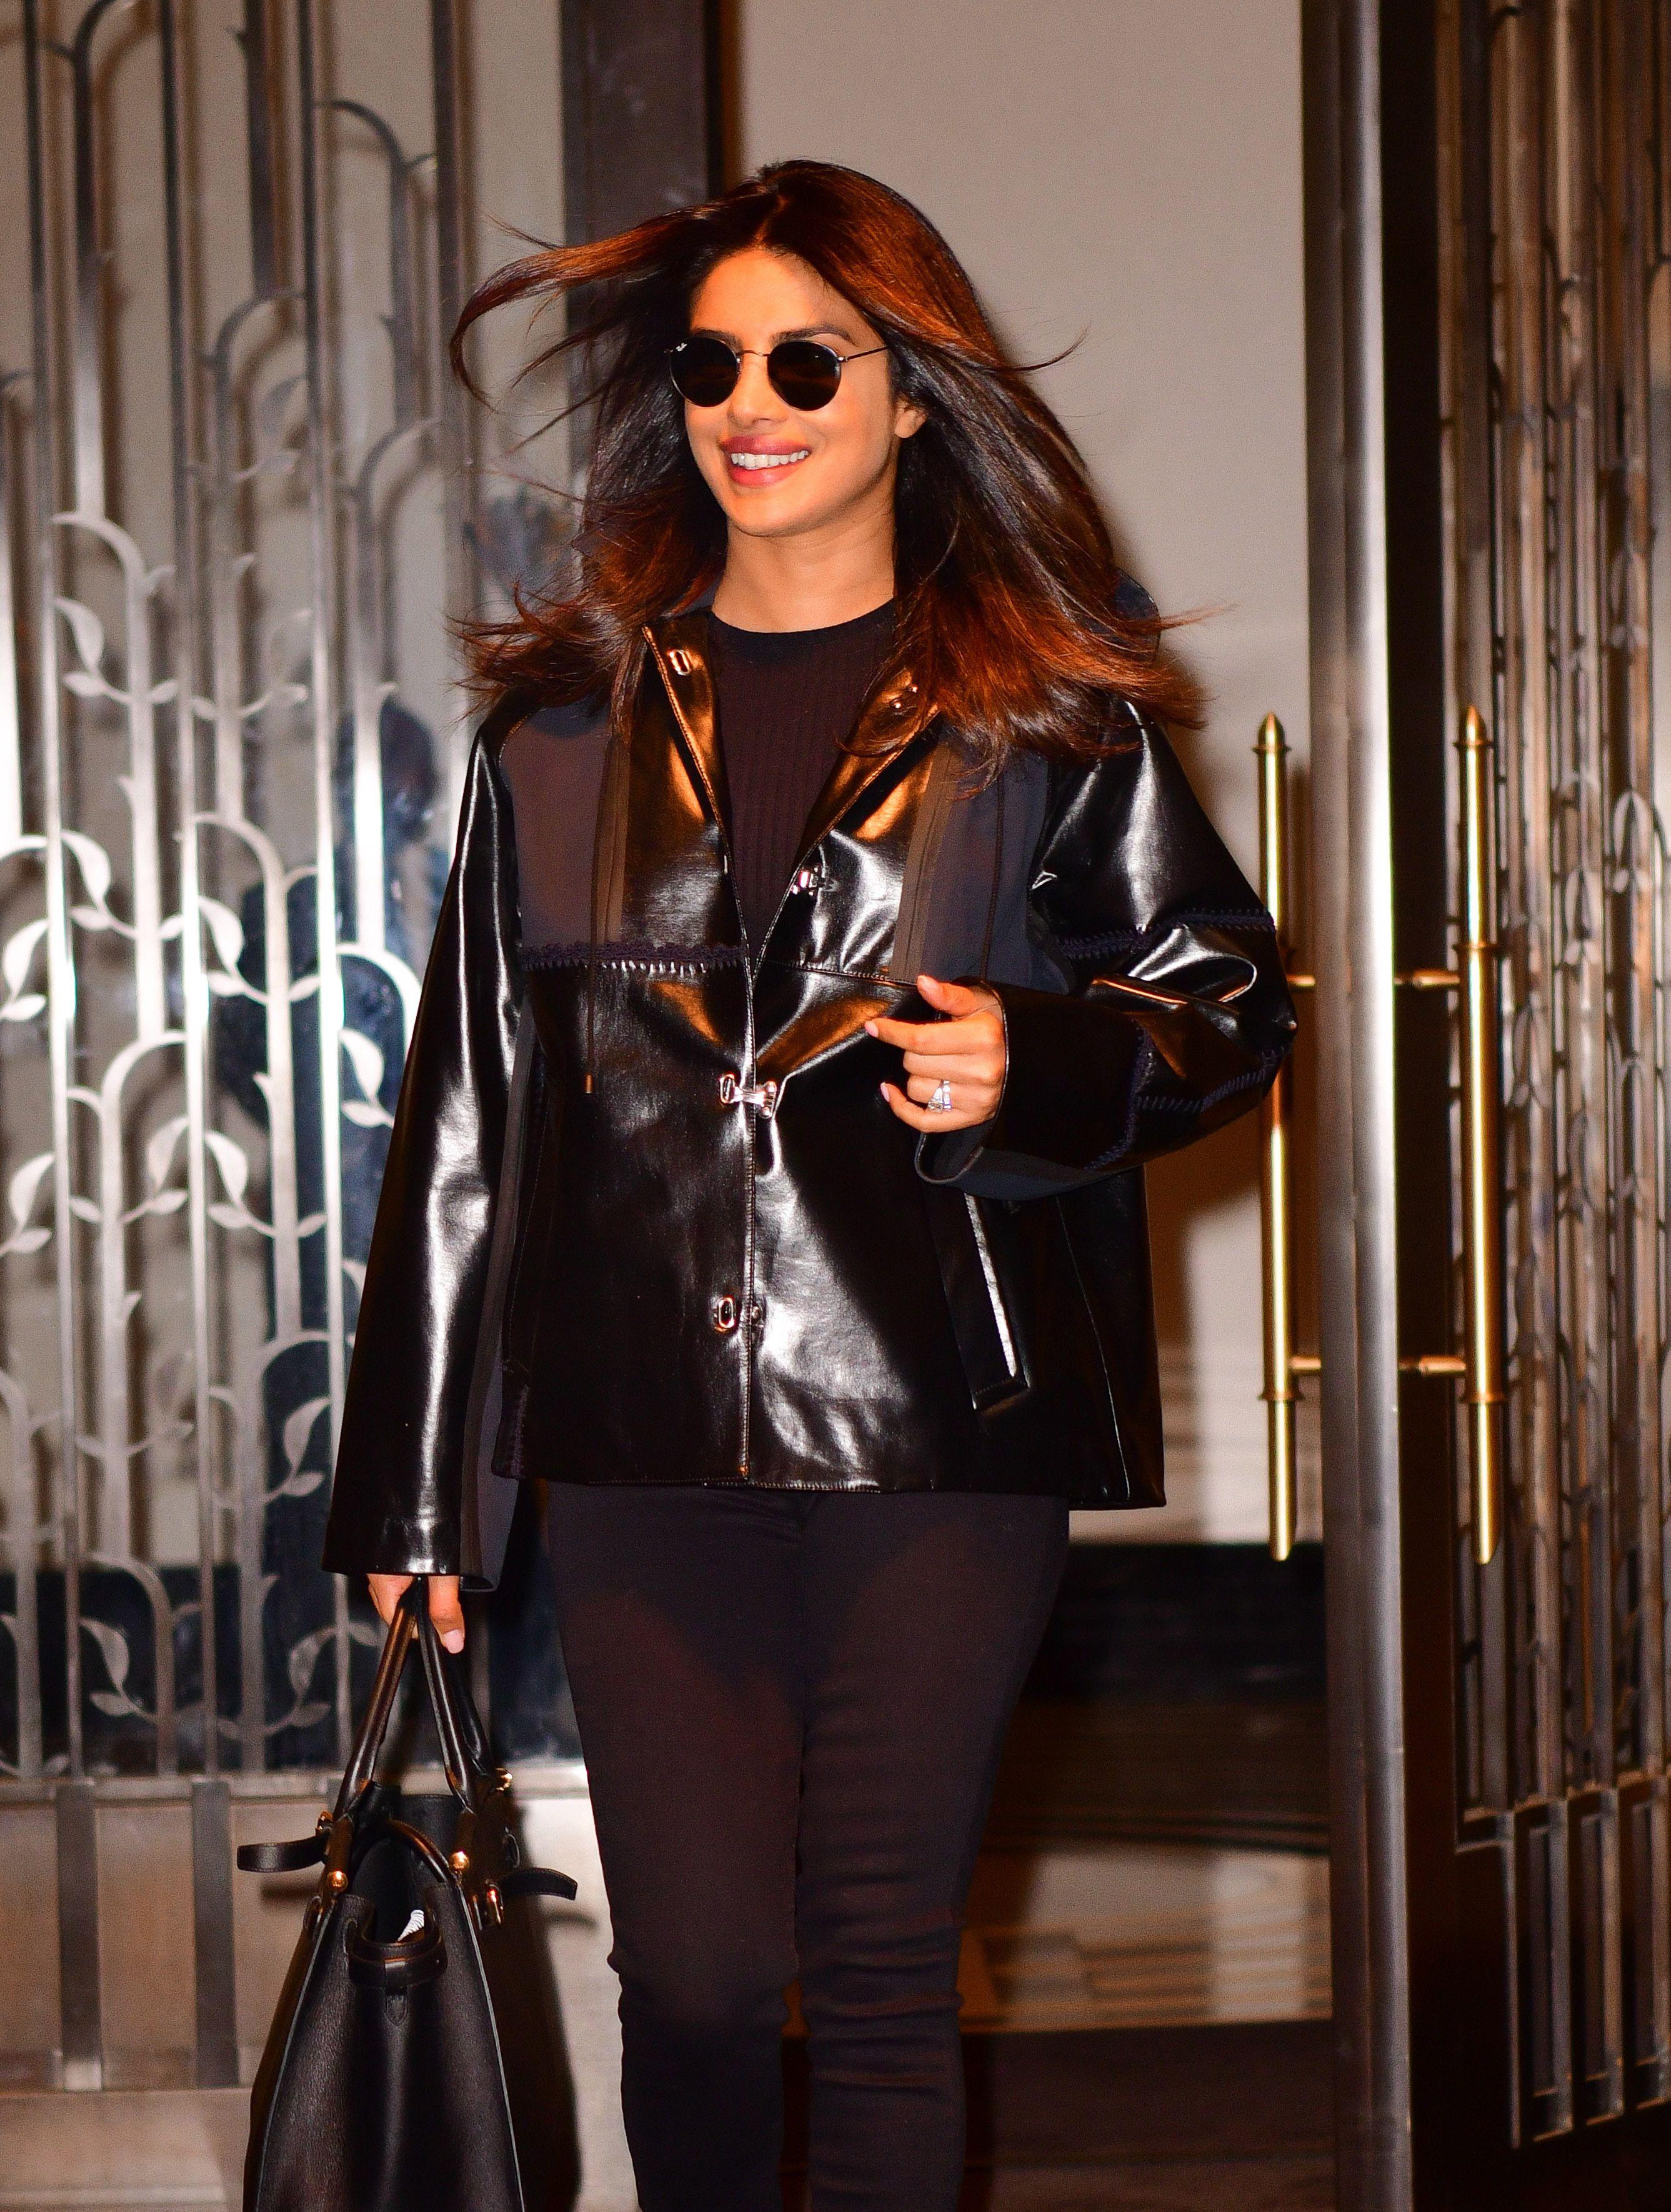 Priyanka Chopra Is Reportedly Joining the New Matrix Film